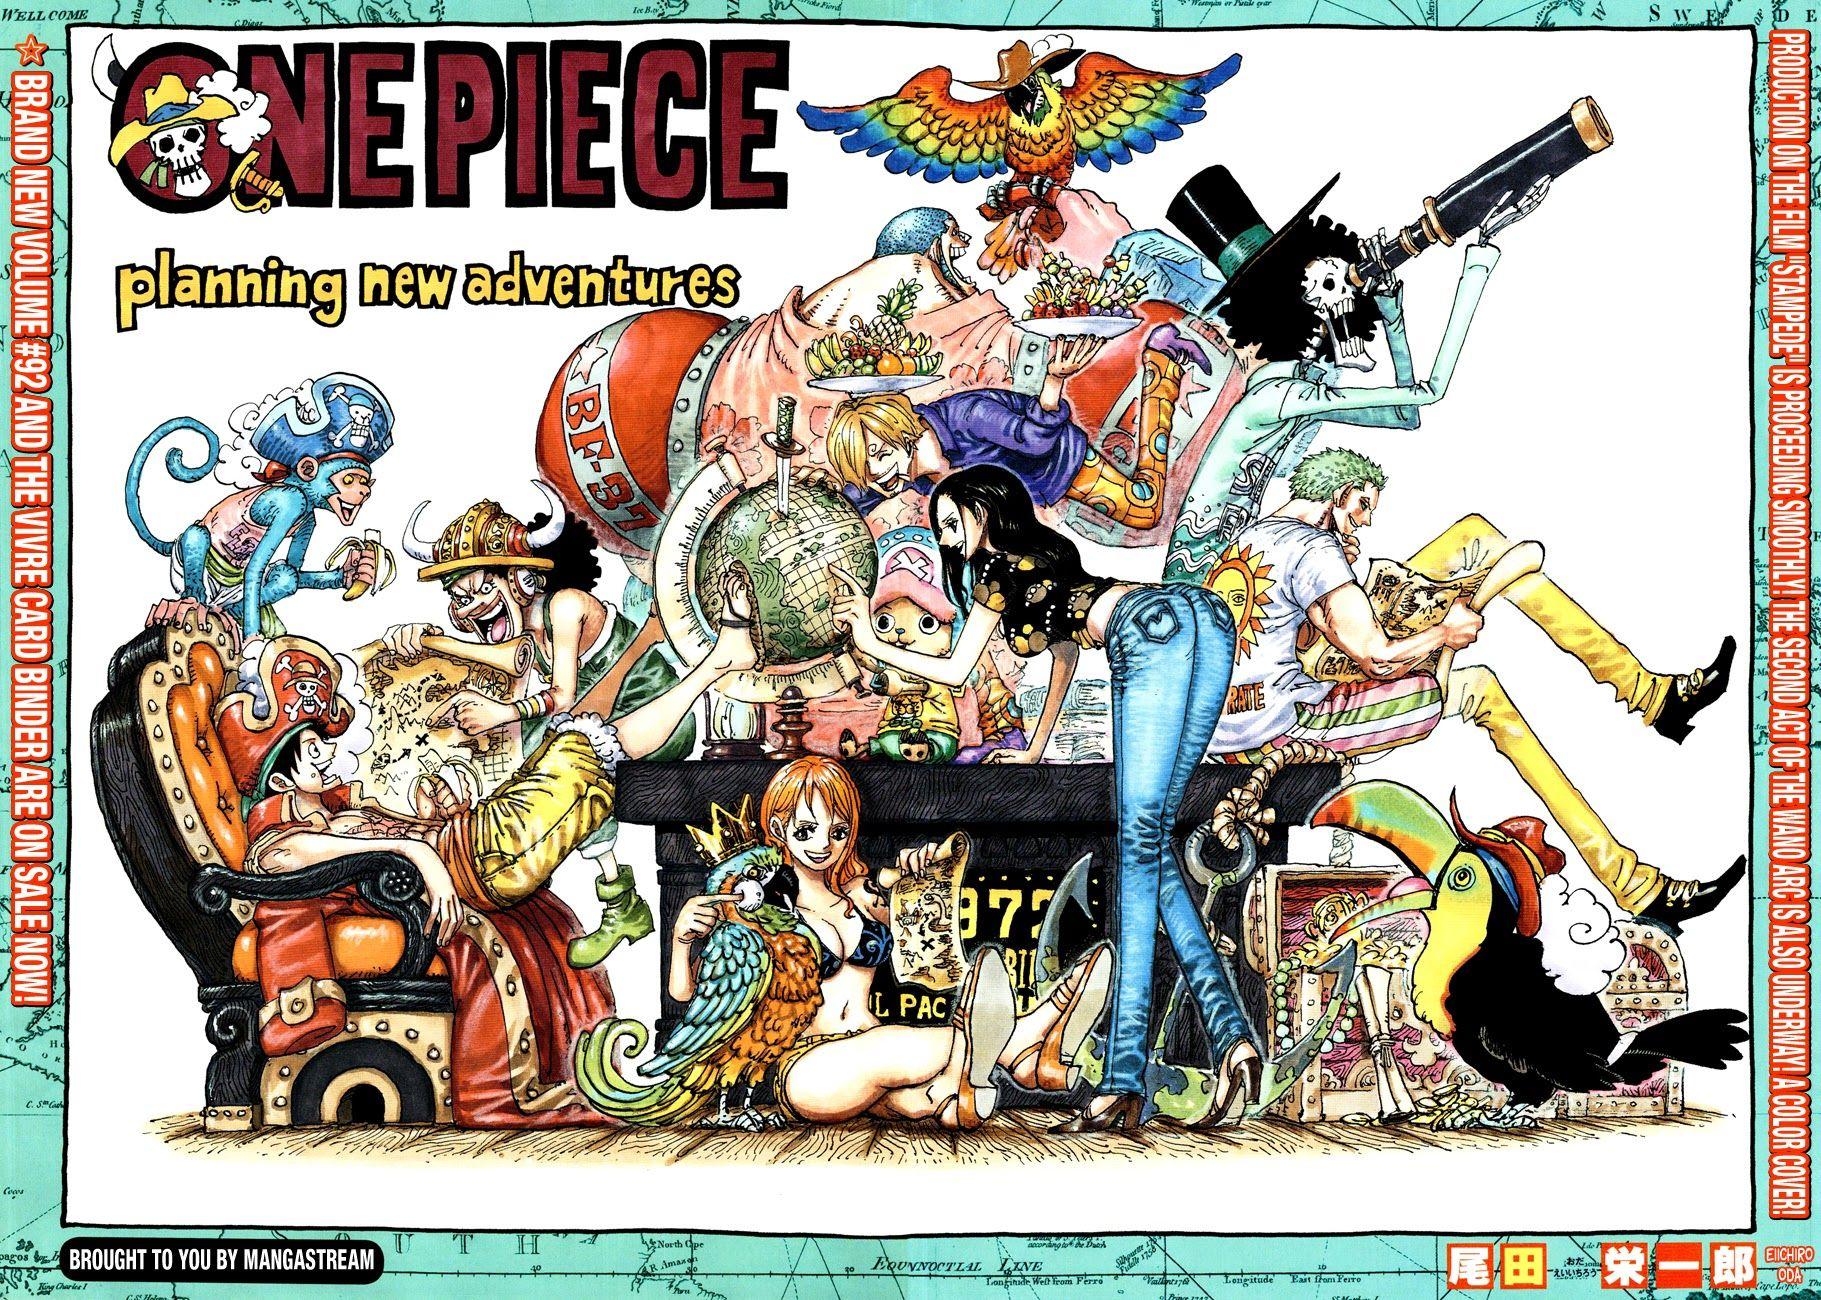 read manga one piece 937 gyukimaru of bandit bridge online in high quality yoooo it s the wano arc mah dudes ワンピース 扉絵 尾田栄一郎 ルフィ ナミ